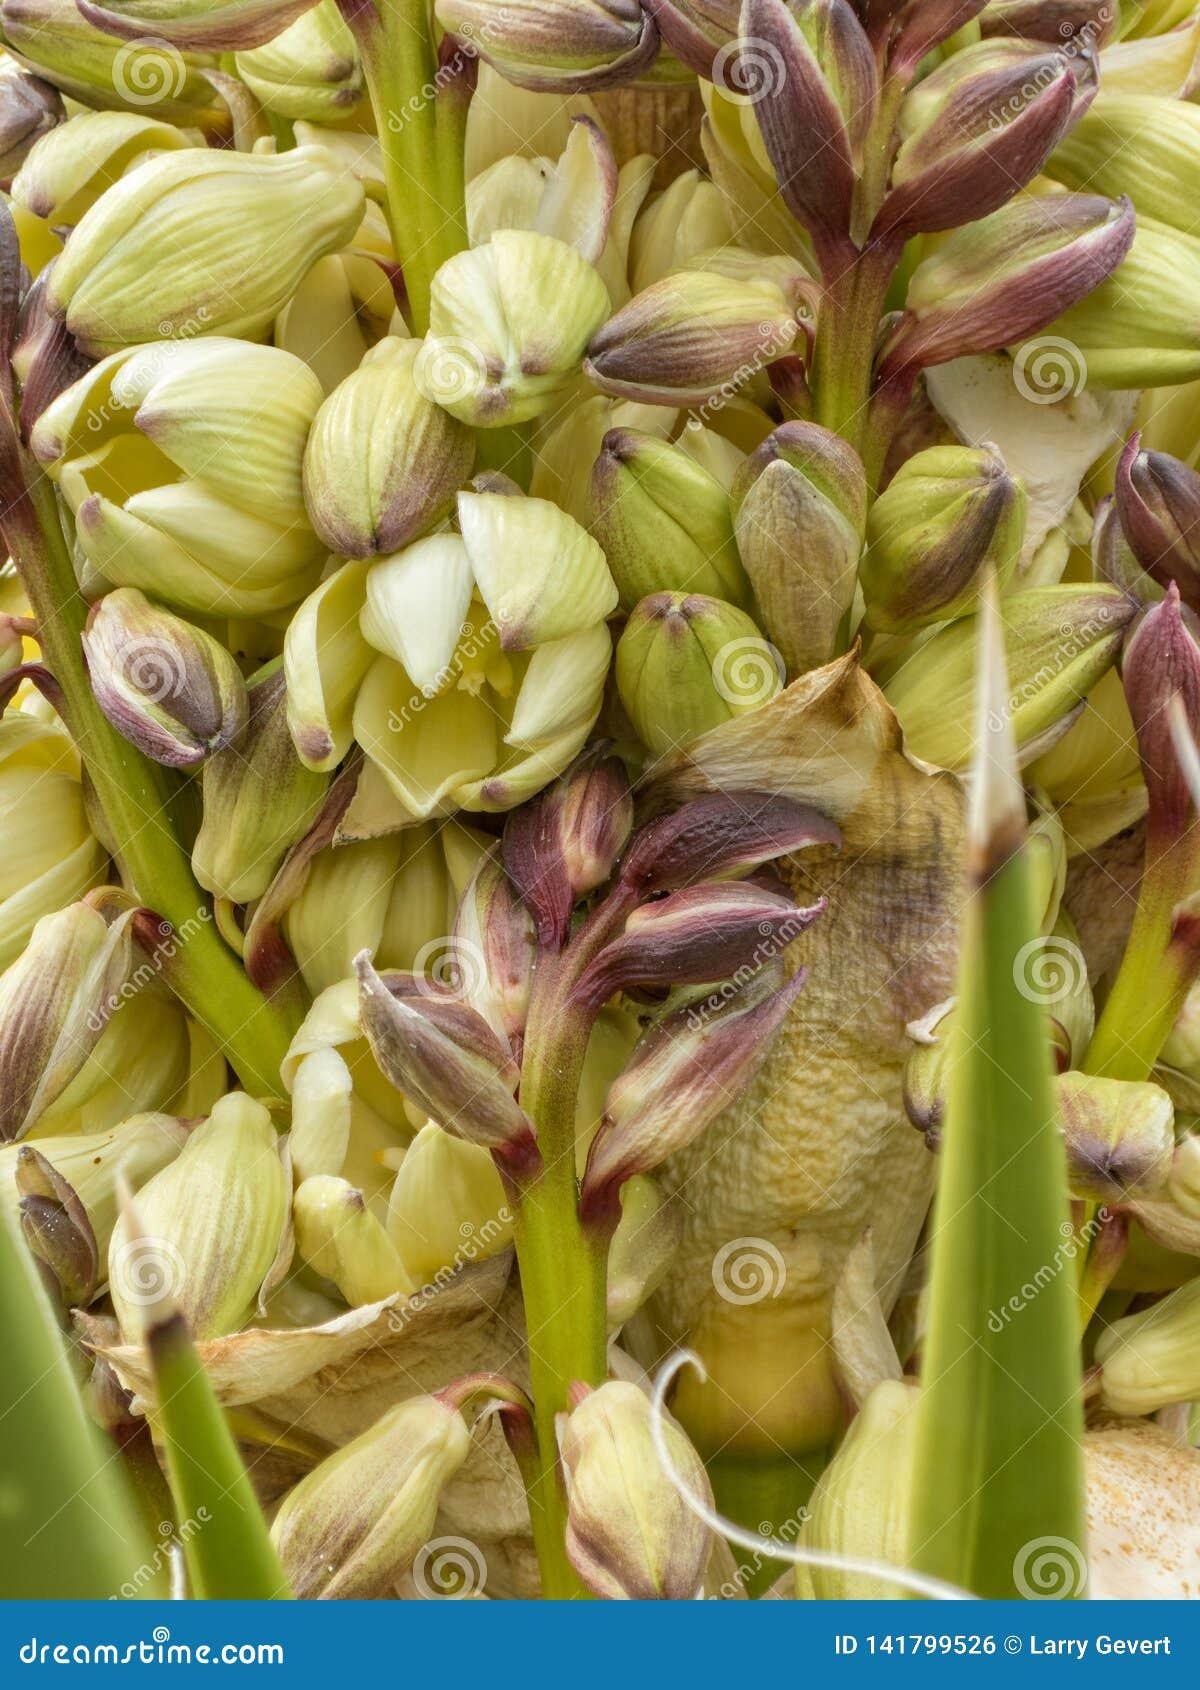 Yucca plant blossoms up close